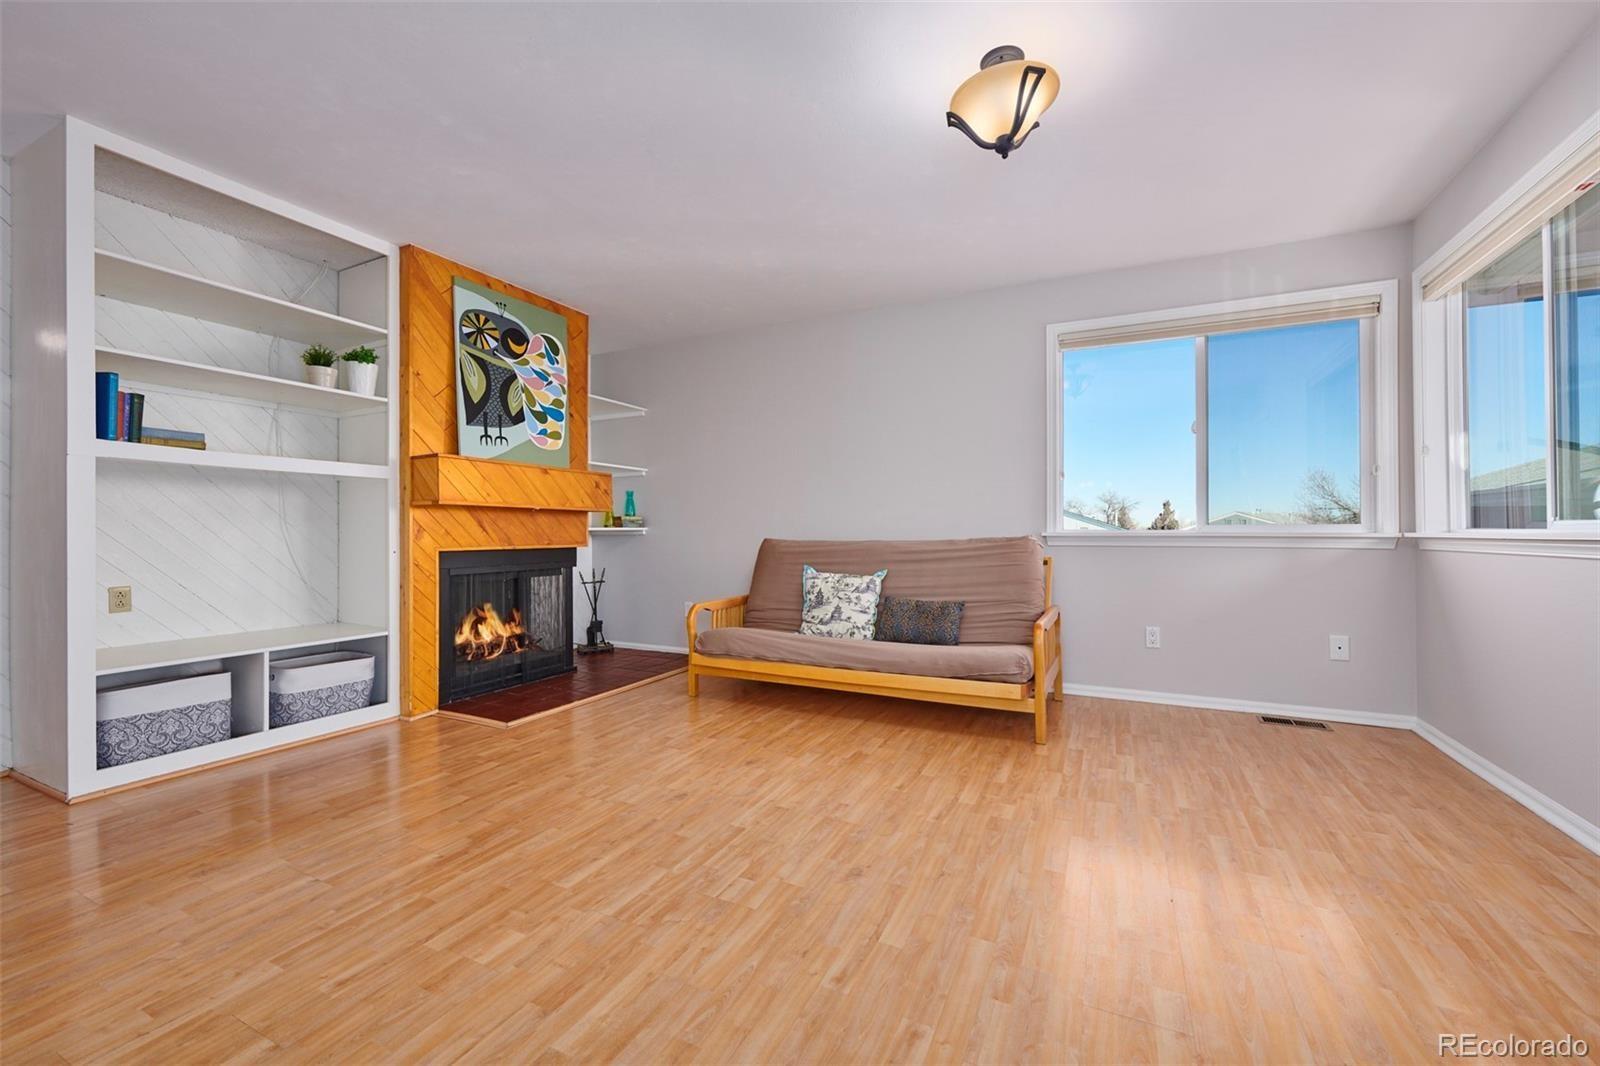 MLS# 4164486 - 7 - 4207 Monroe Drive #D, Boulder, CO 80303